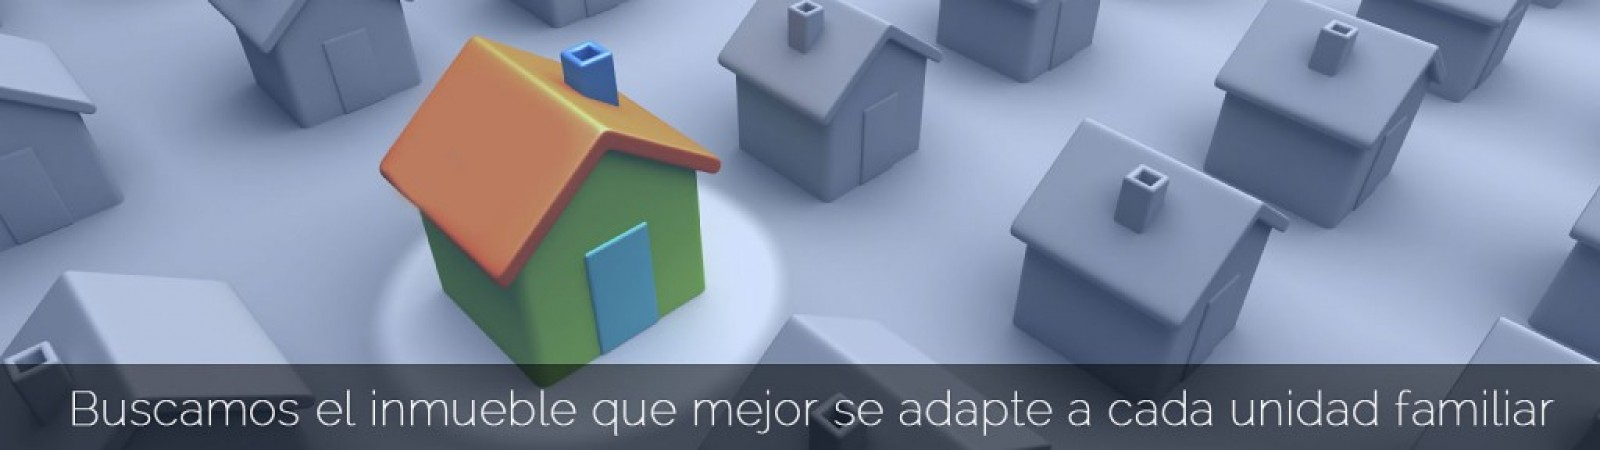 Alquiler de viviendas Madrid. Inicio